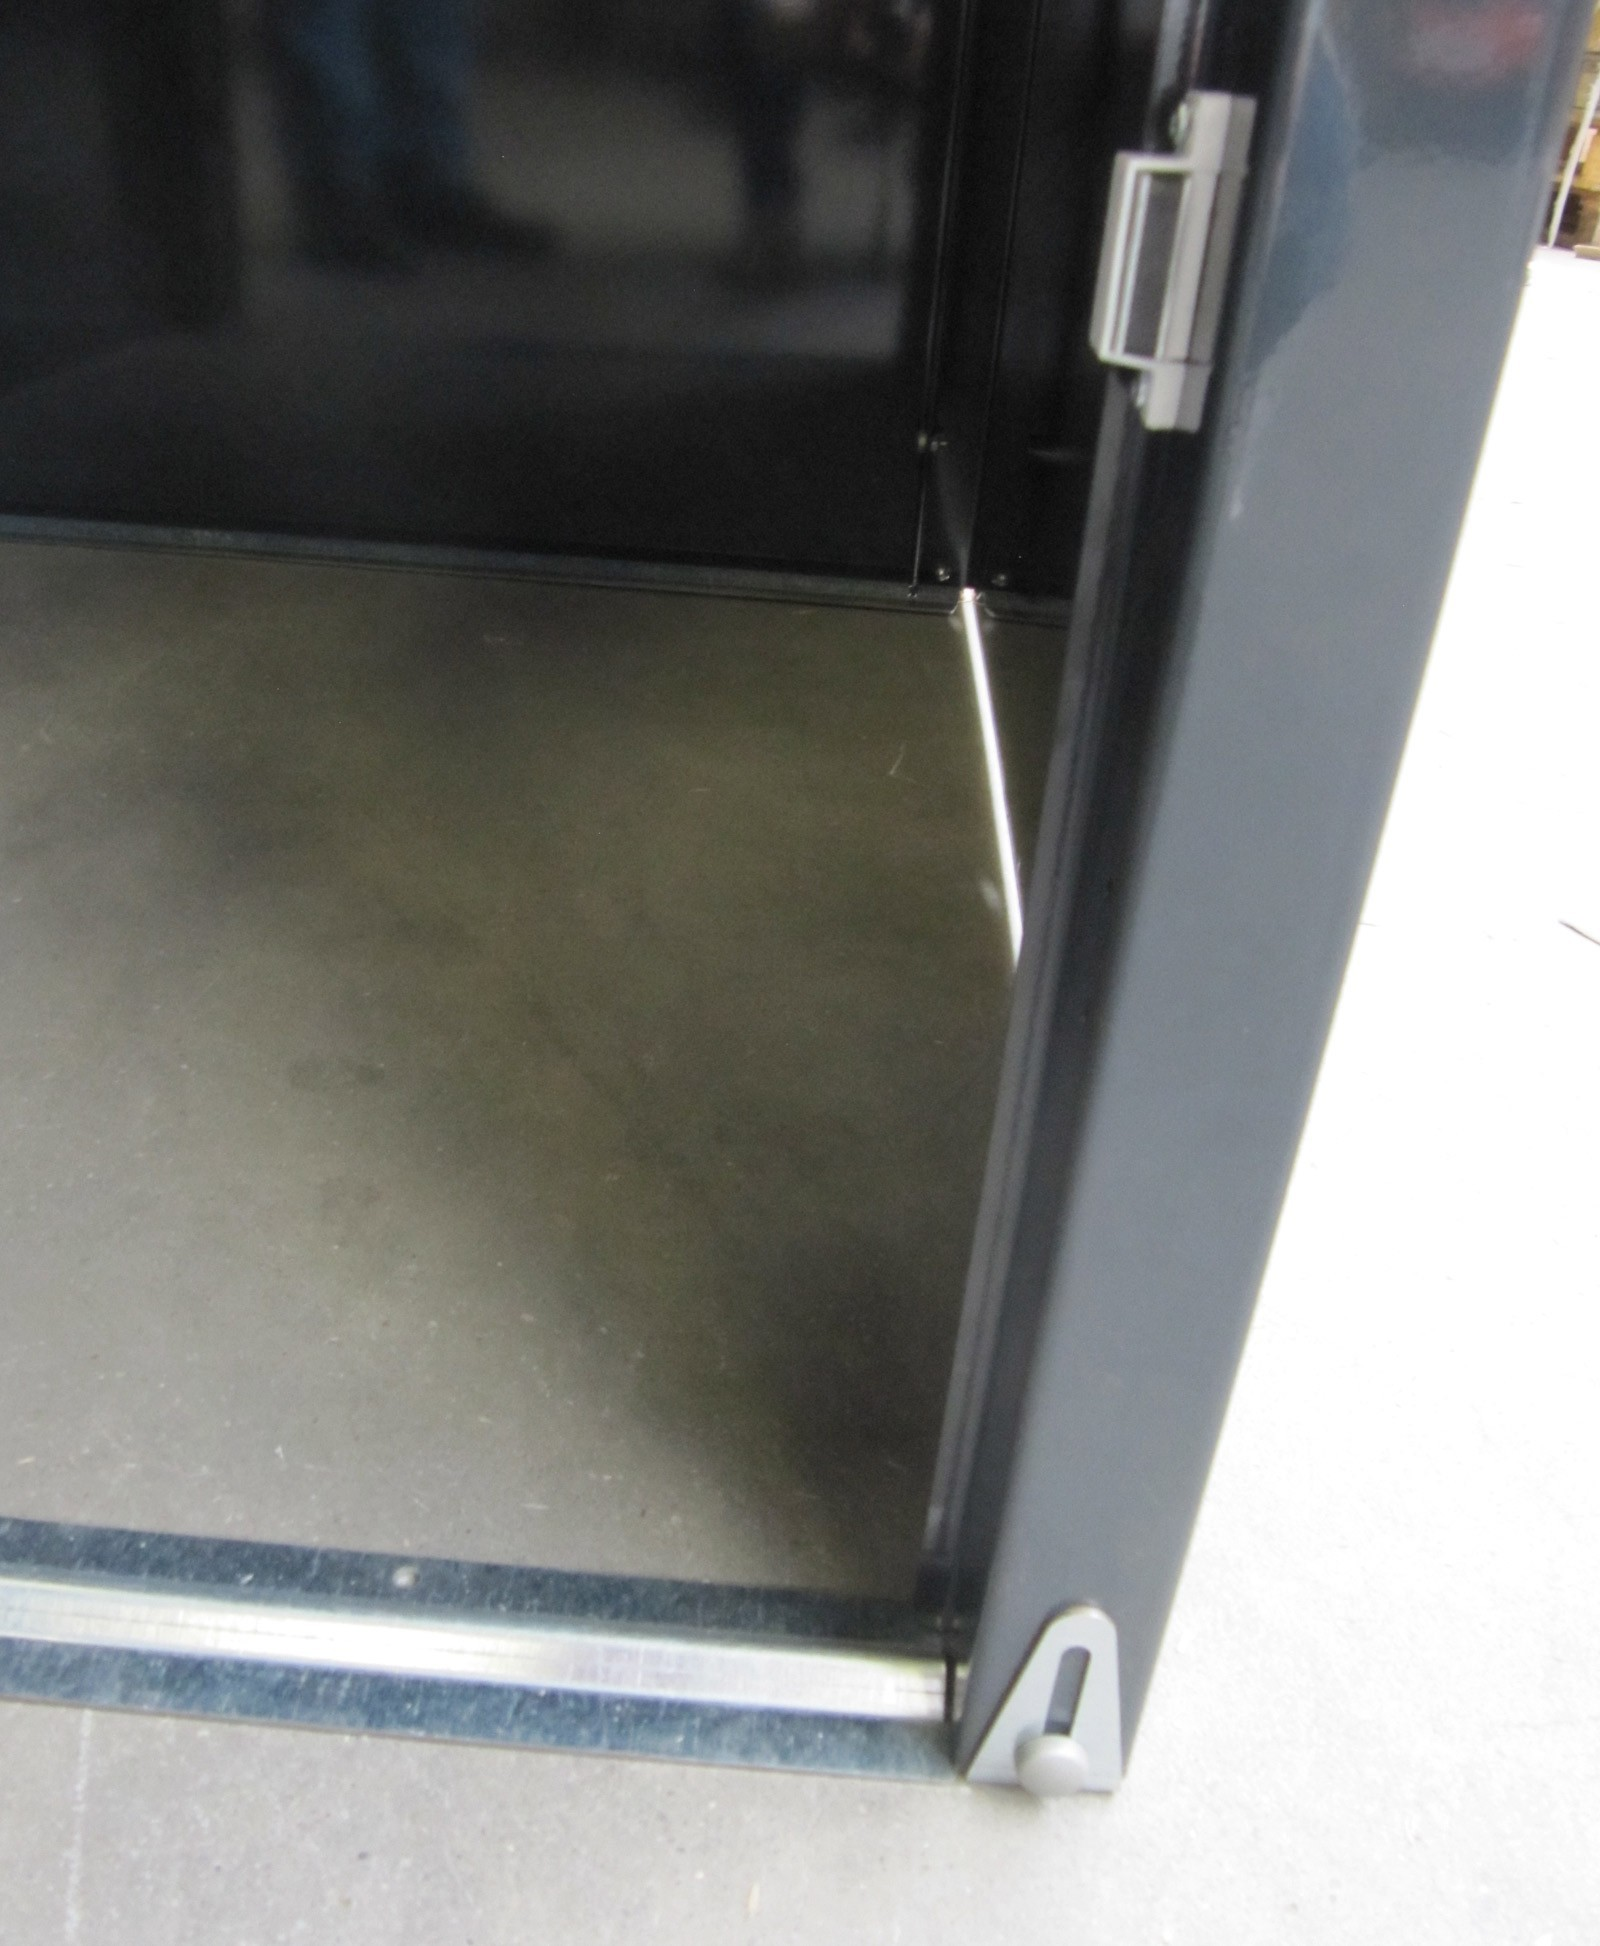 Universalbox / Mülltonnenbox Metall anthrazit 71x82x120cm Bild 3